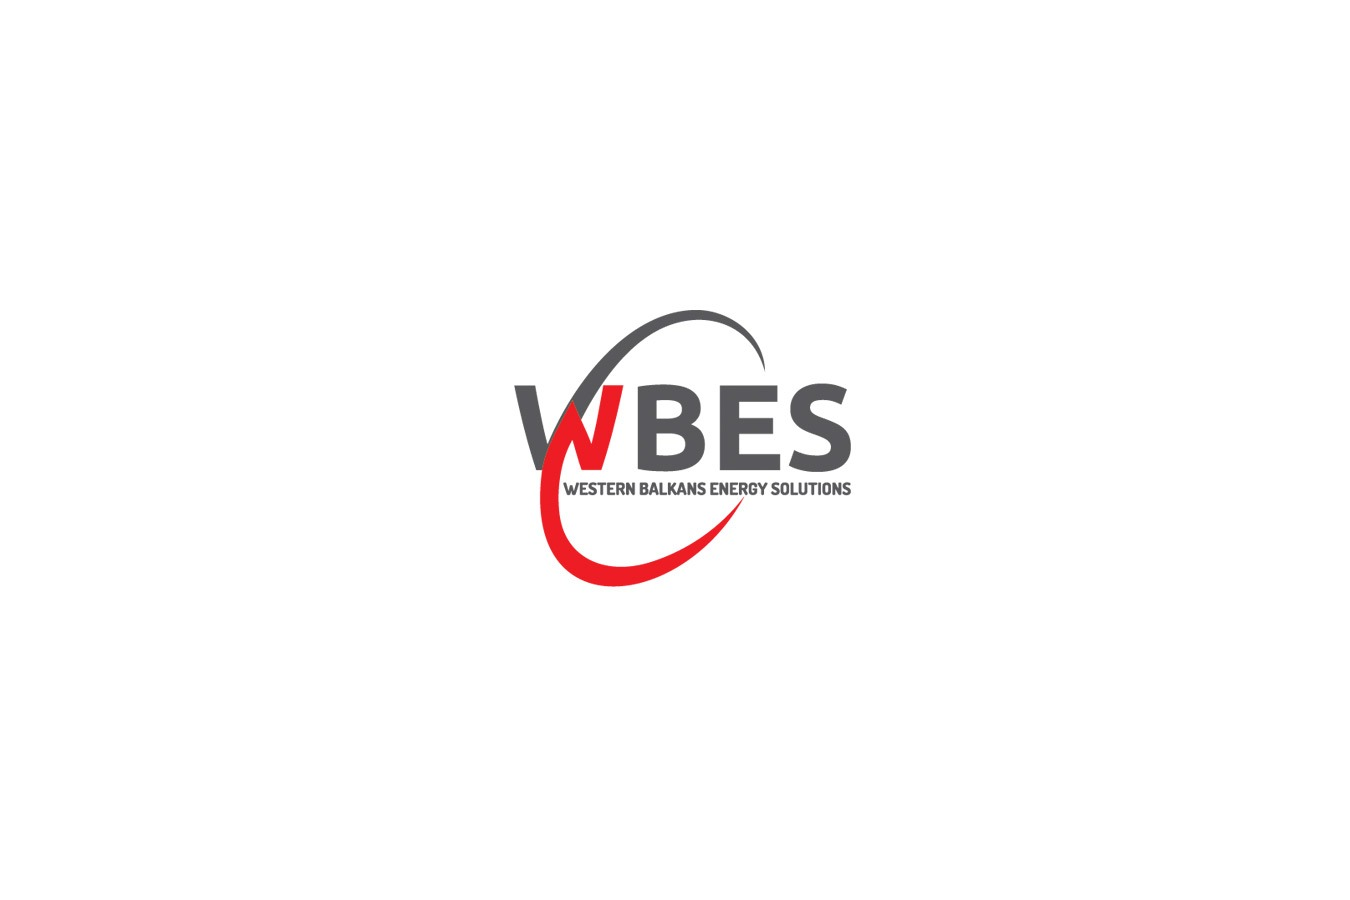 Izrada logotipa za Western Balkans Energy Solutions